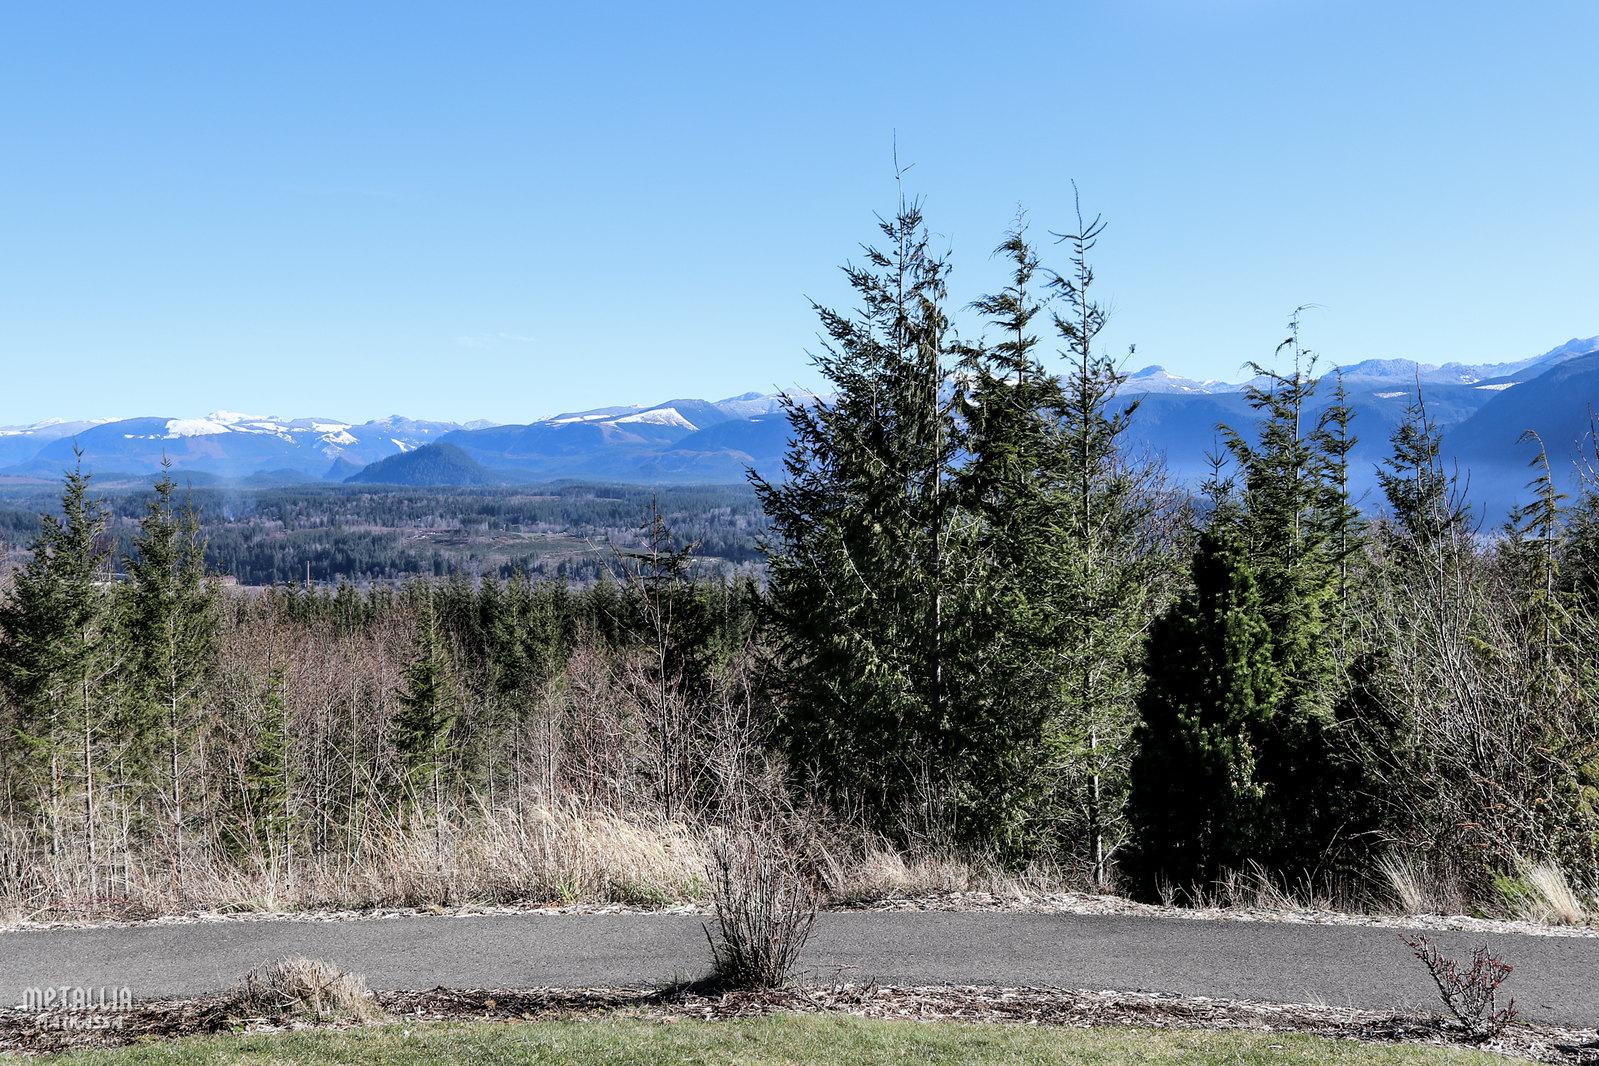 laura palmer, twin peaks, twin peaks filming locations, twin peaks picnic scene, twin peaksin kuvauspaikat